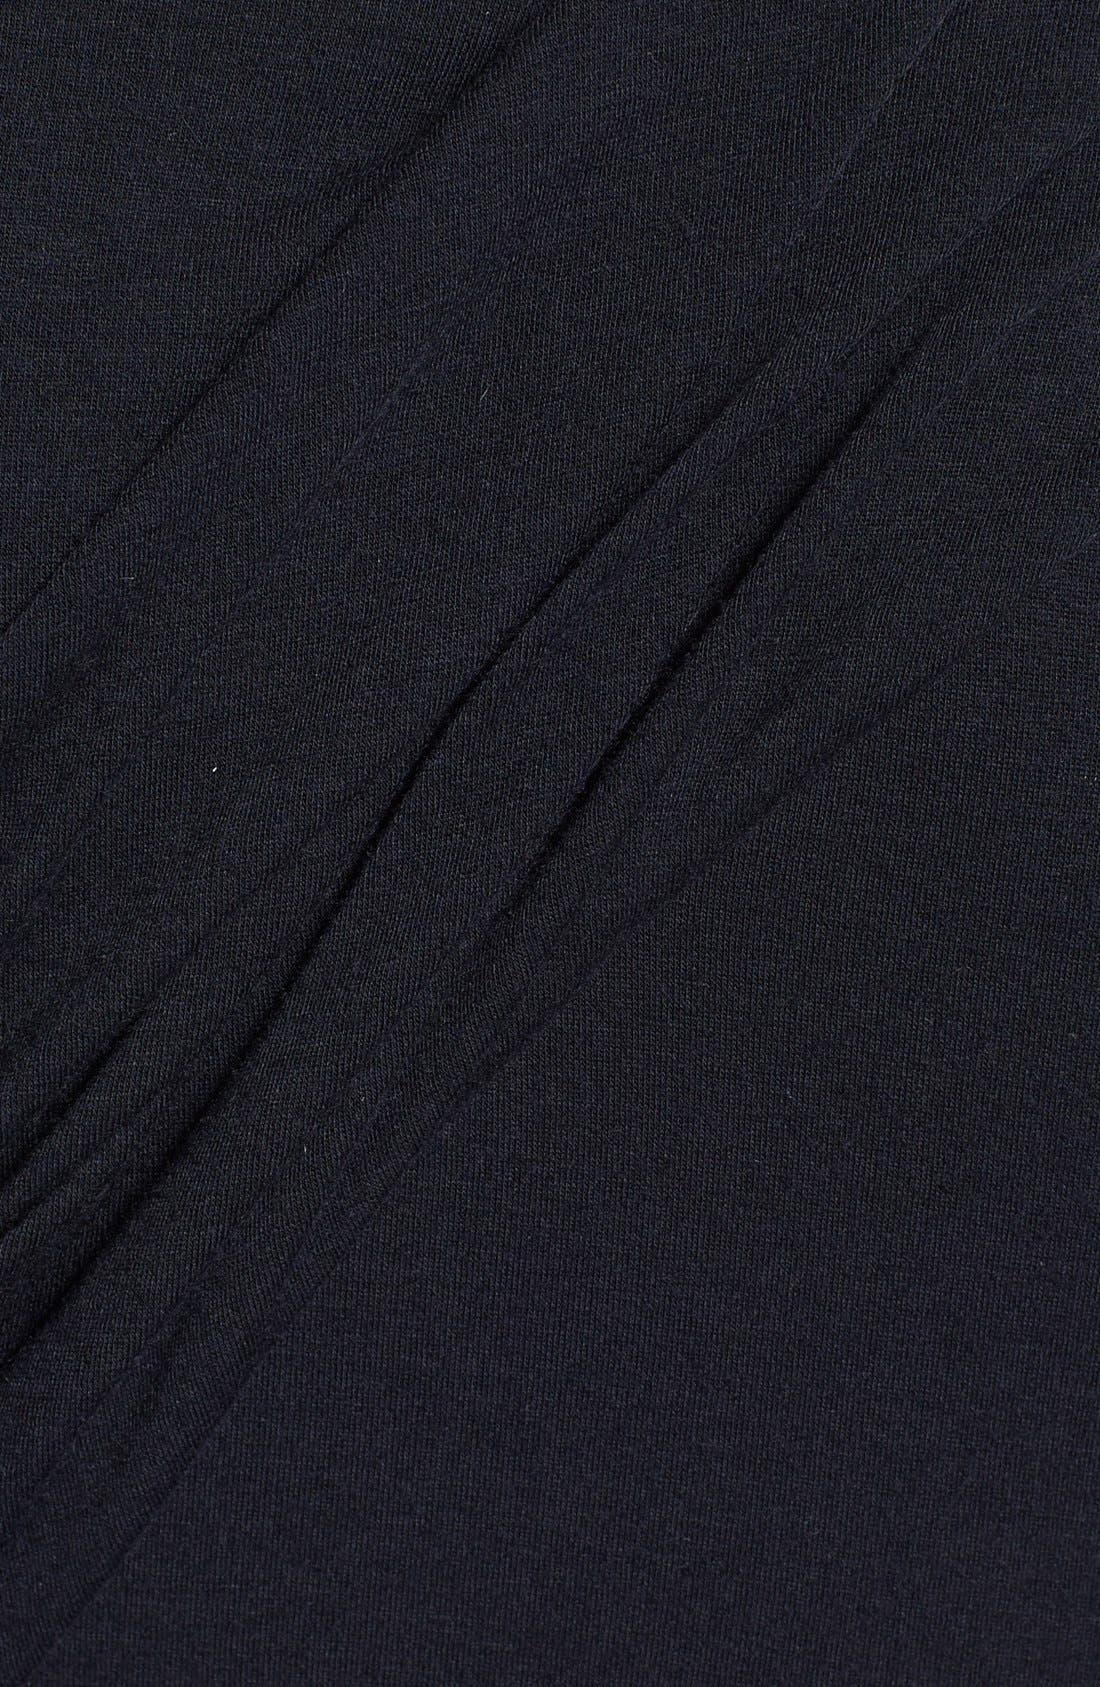 Gathered Jersey Dress,                             Alternate thumbnail 2, color,